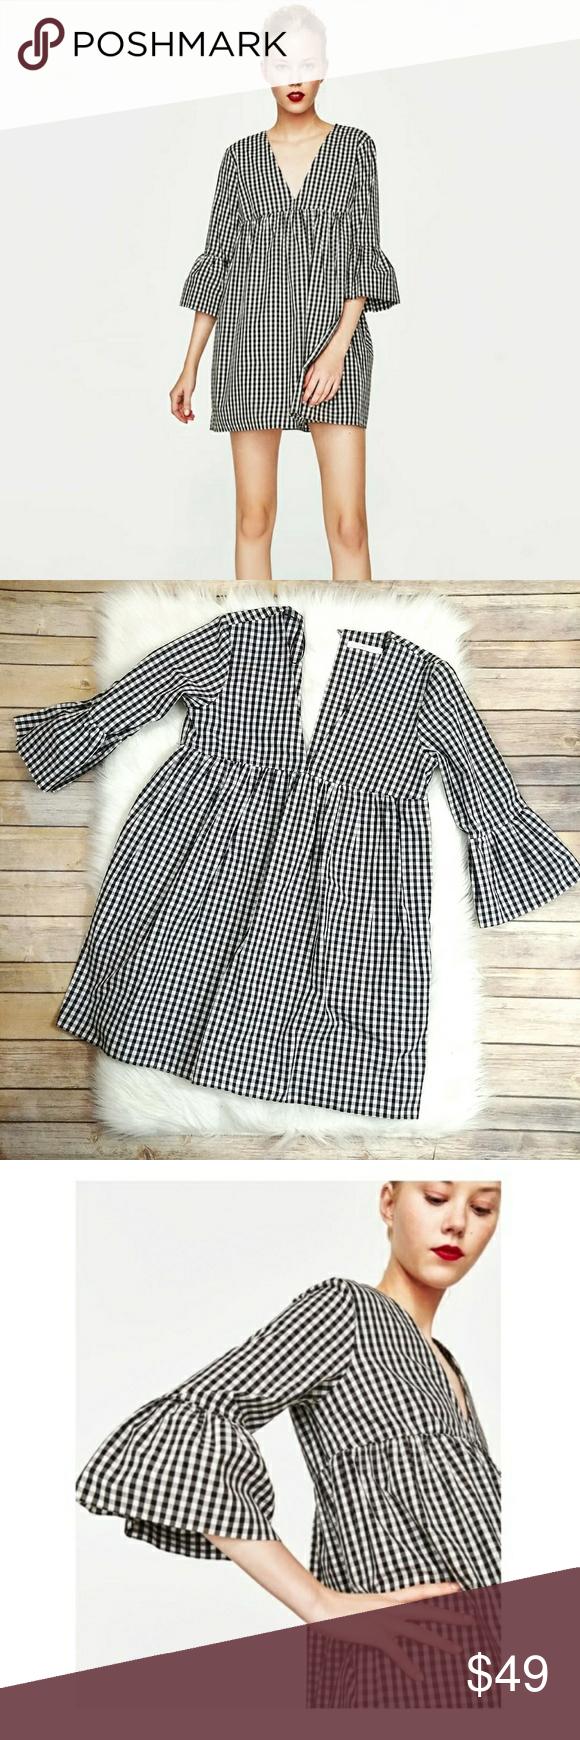 f8606c37a6 Gingham Jumpsuit Dress Zara | Saddha